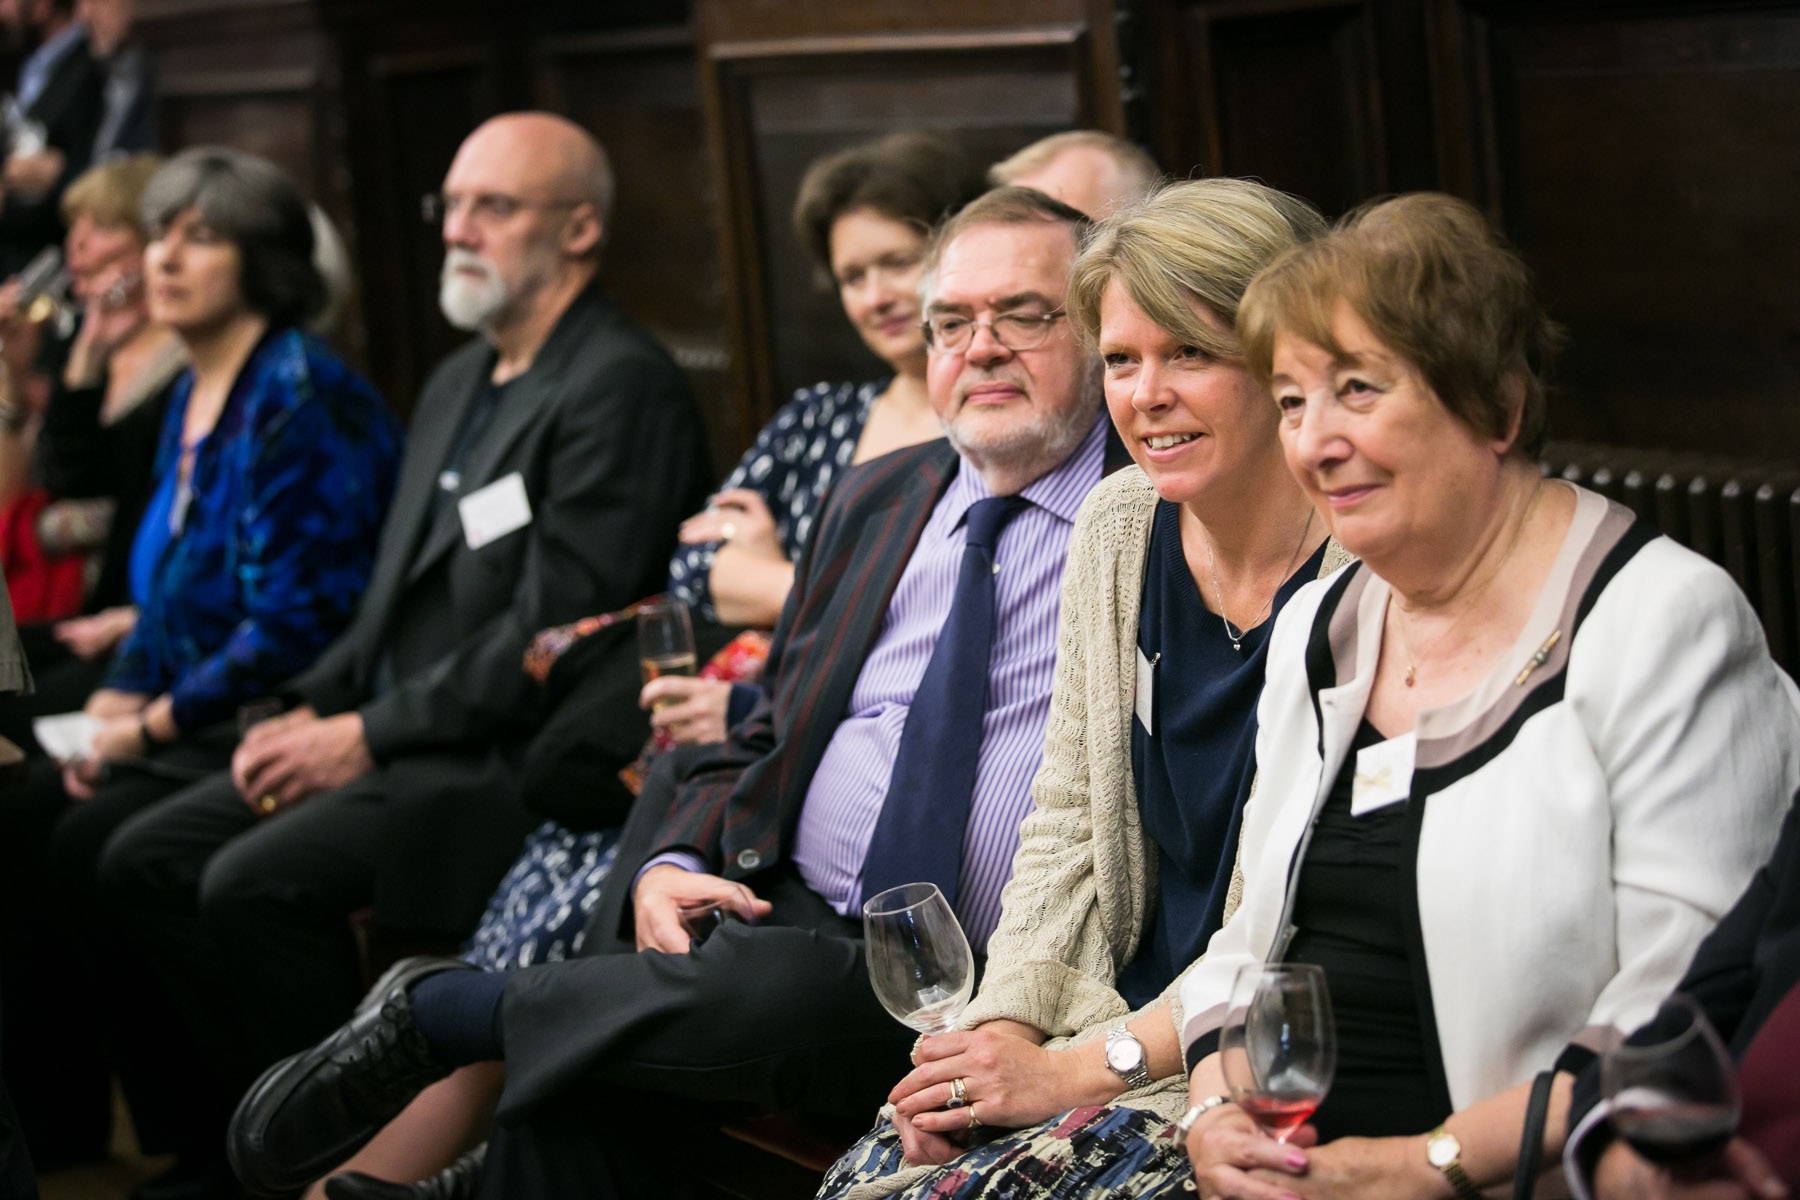 Lesley Linches, Lachie Munro, Sophie Ransome, Iain Stevenson, Clare Foss, Ann Granger